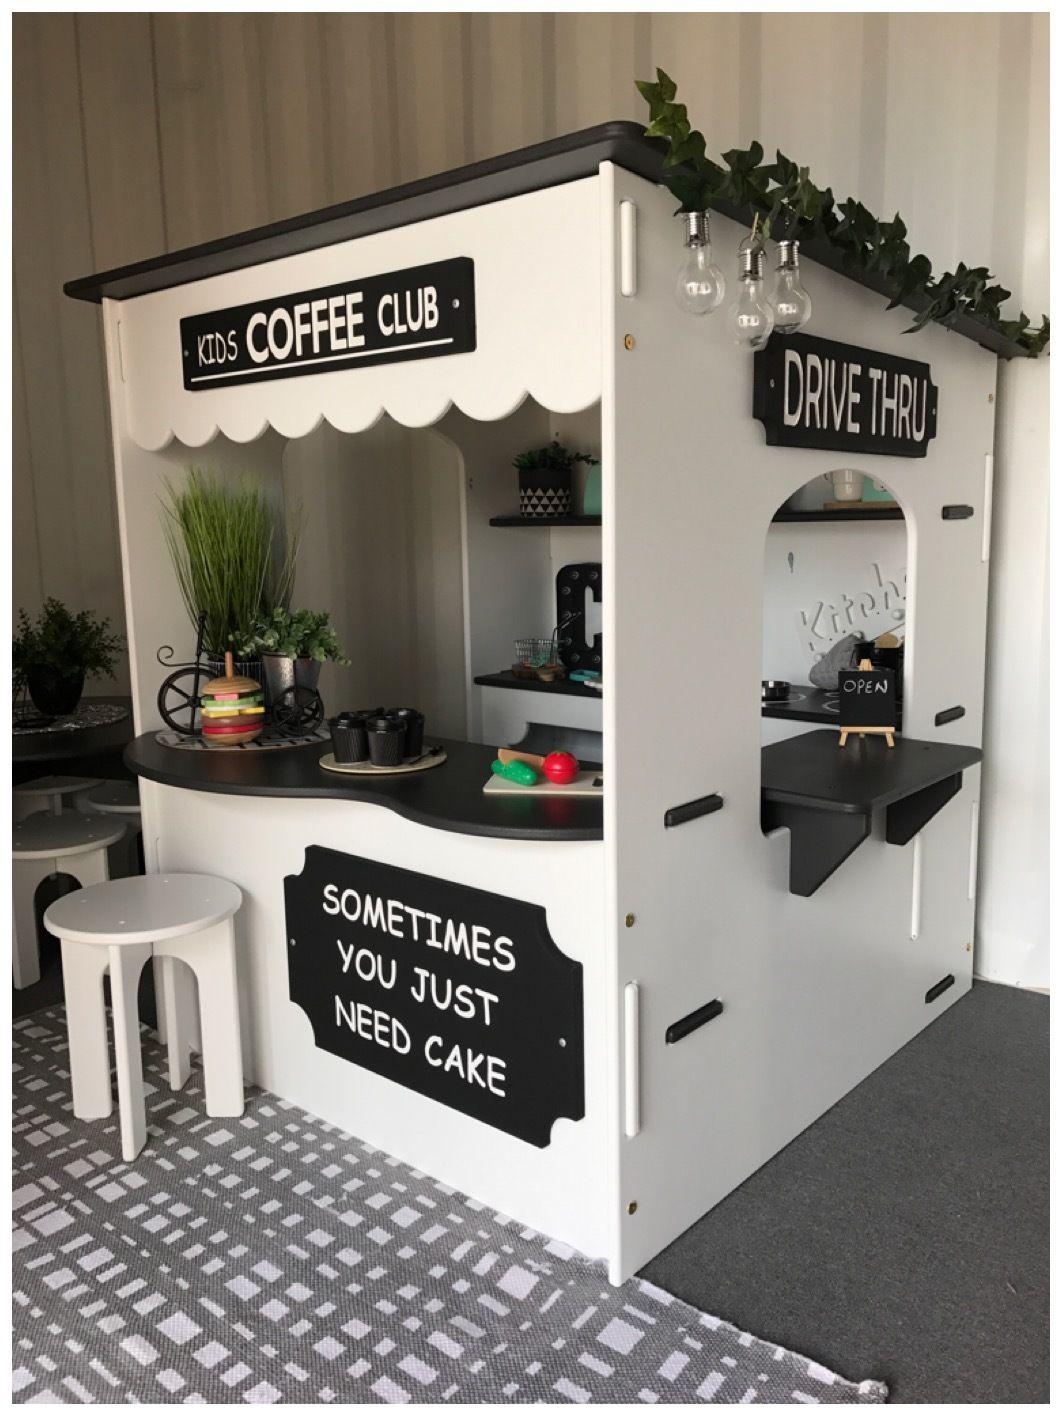 Cafe04 Cafe Cubby Inbuilt Kitchen Amp Drive Thru Window Kids Cafe Kids Kitchen